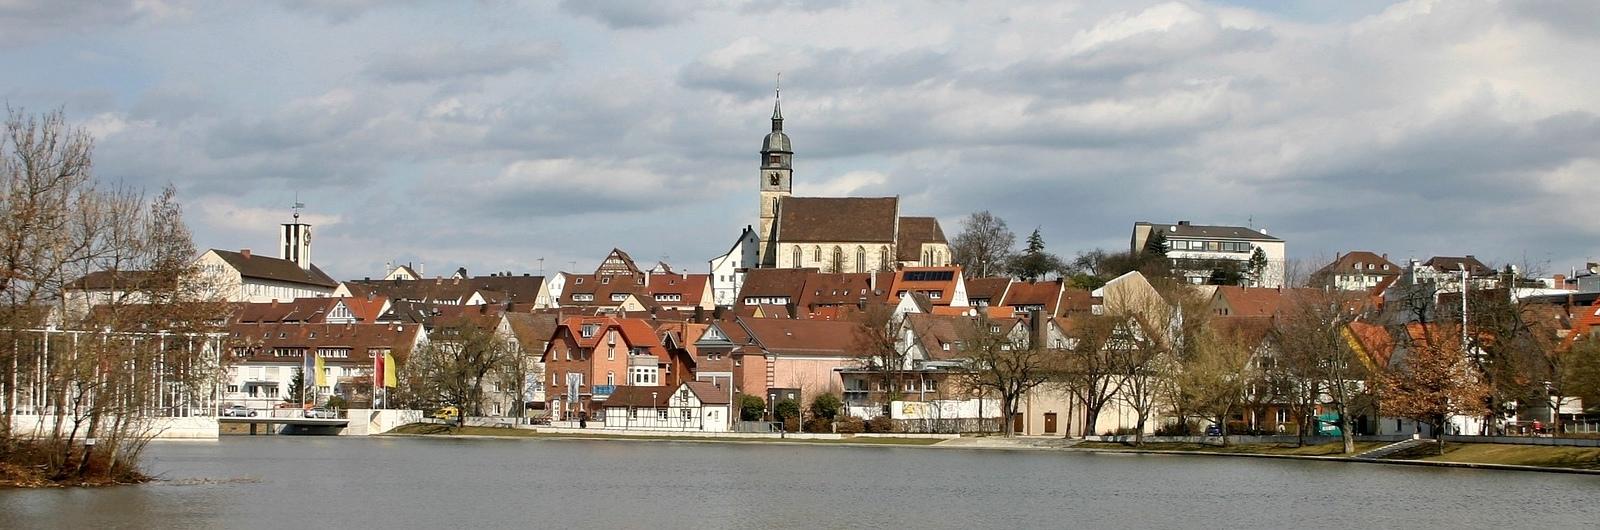 boeblingen city header